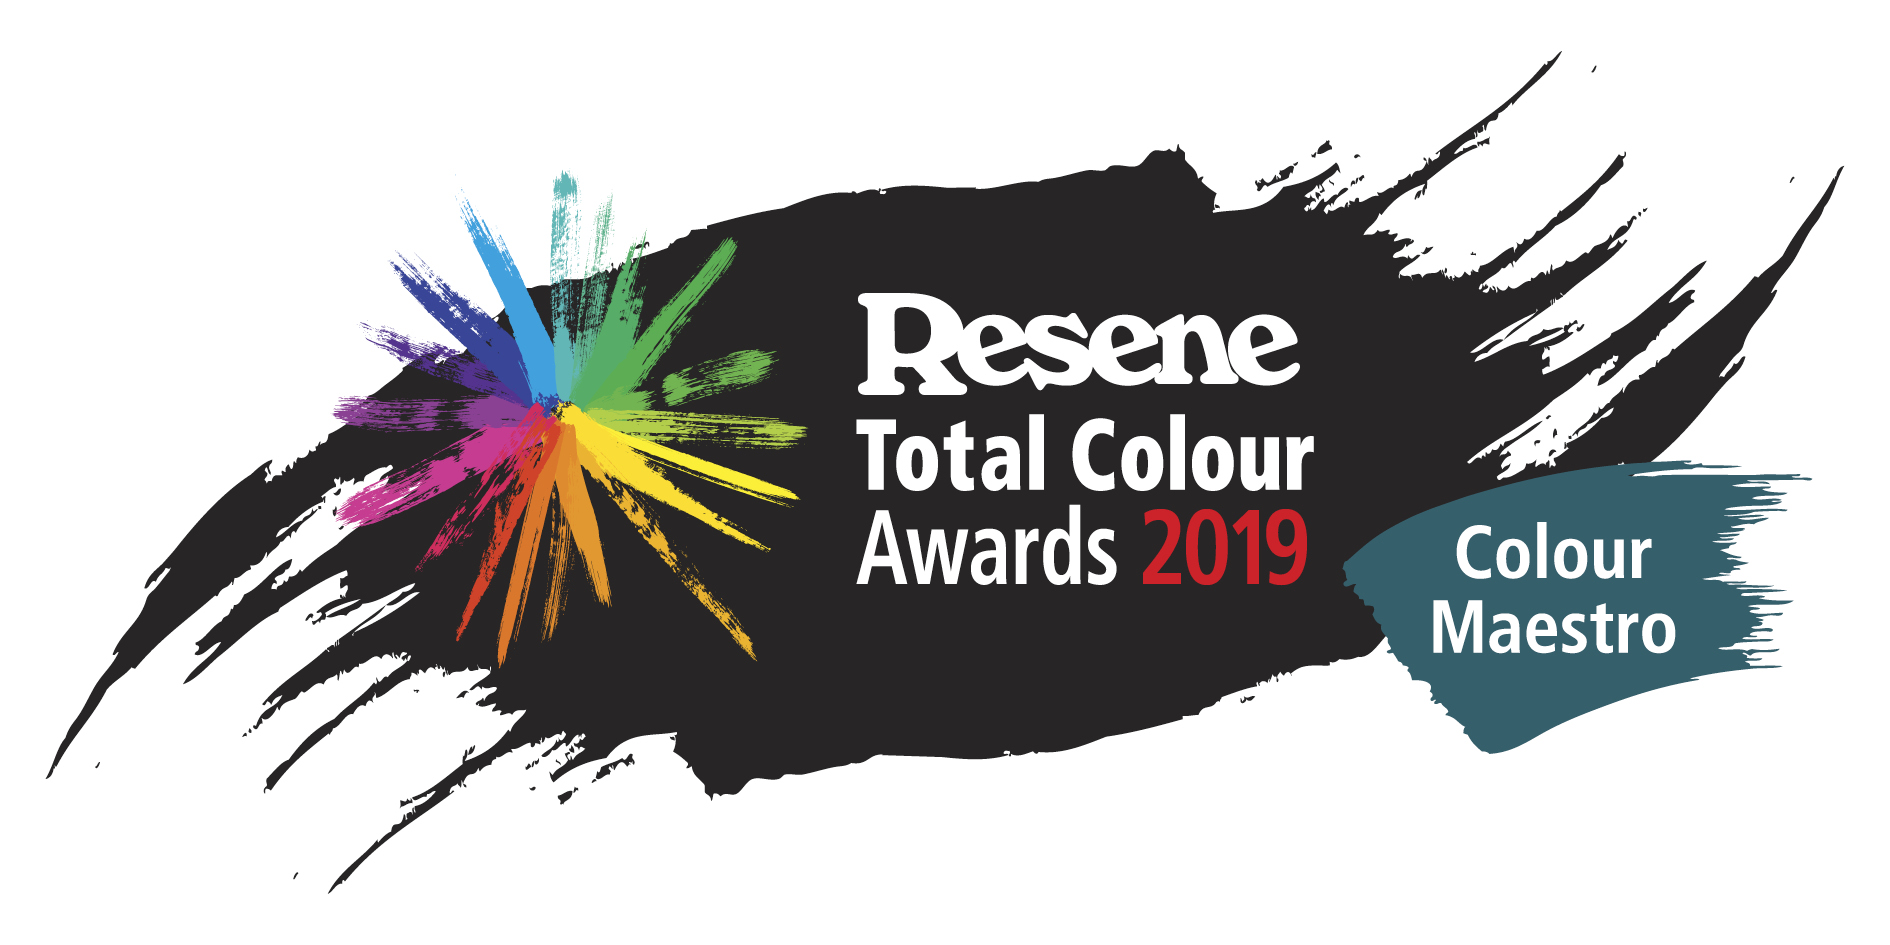 Winner of the prestigious Colour Maestro Award at the Resene Total Colour Awards 2019